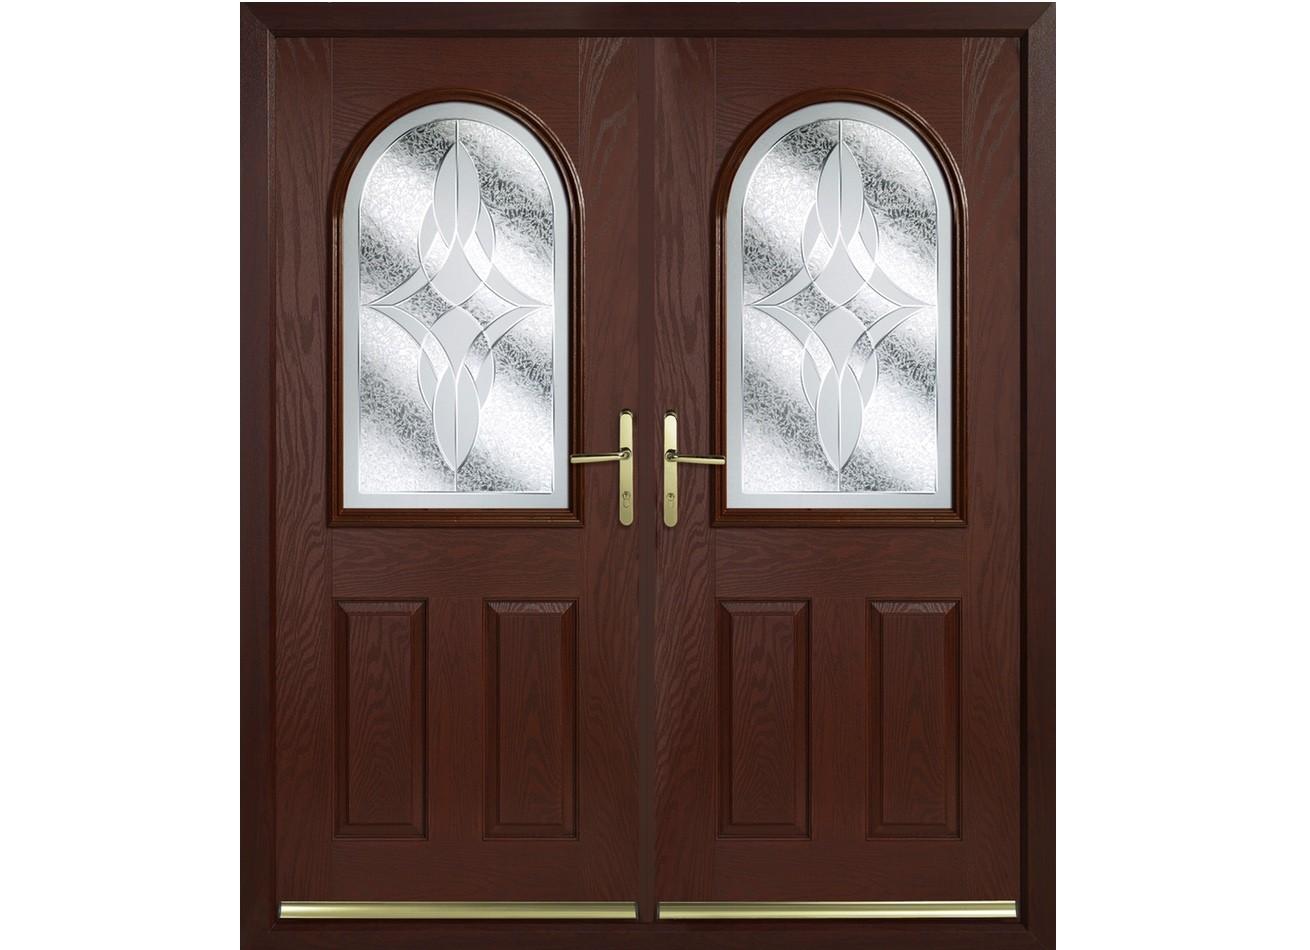 Home security vevo upvc replacement door locks new item rubansaba